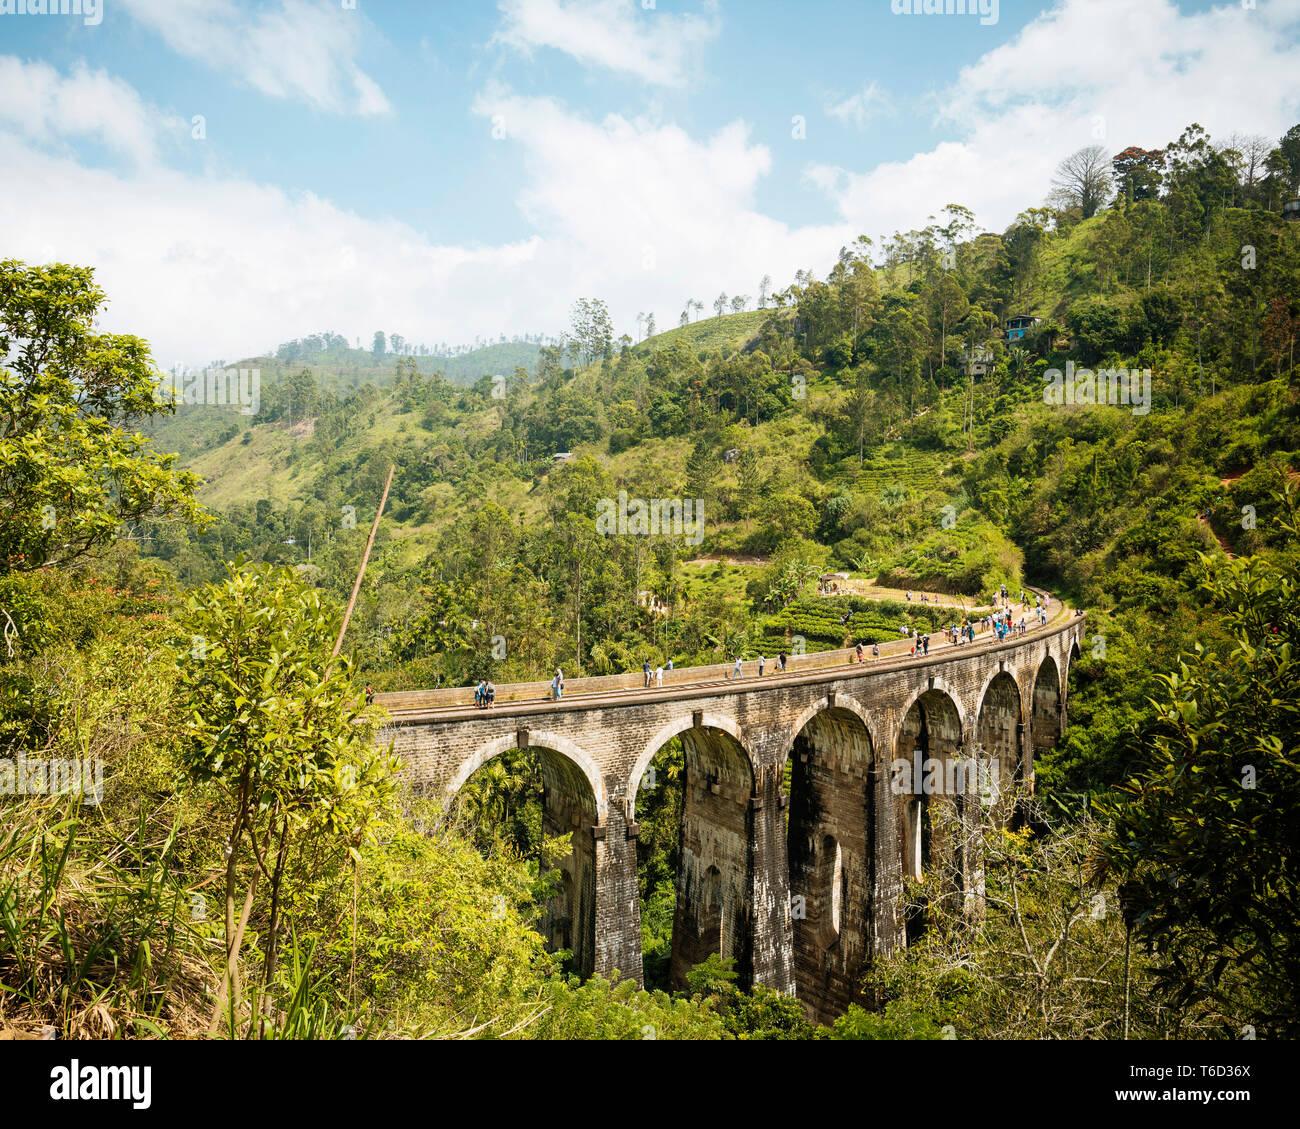 9 Puente de arco, Ella, provincia de Uva, Sri Lanka, Asia Foto de stock